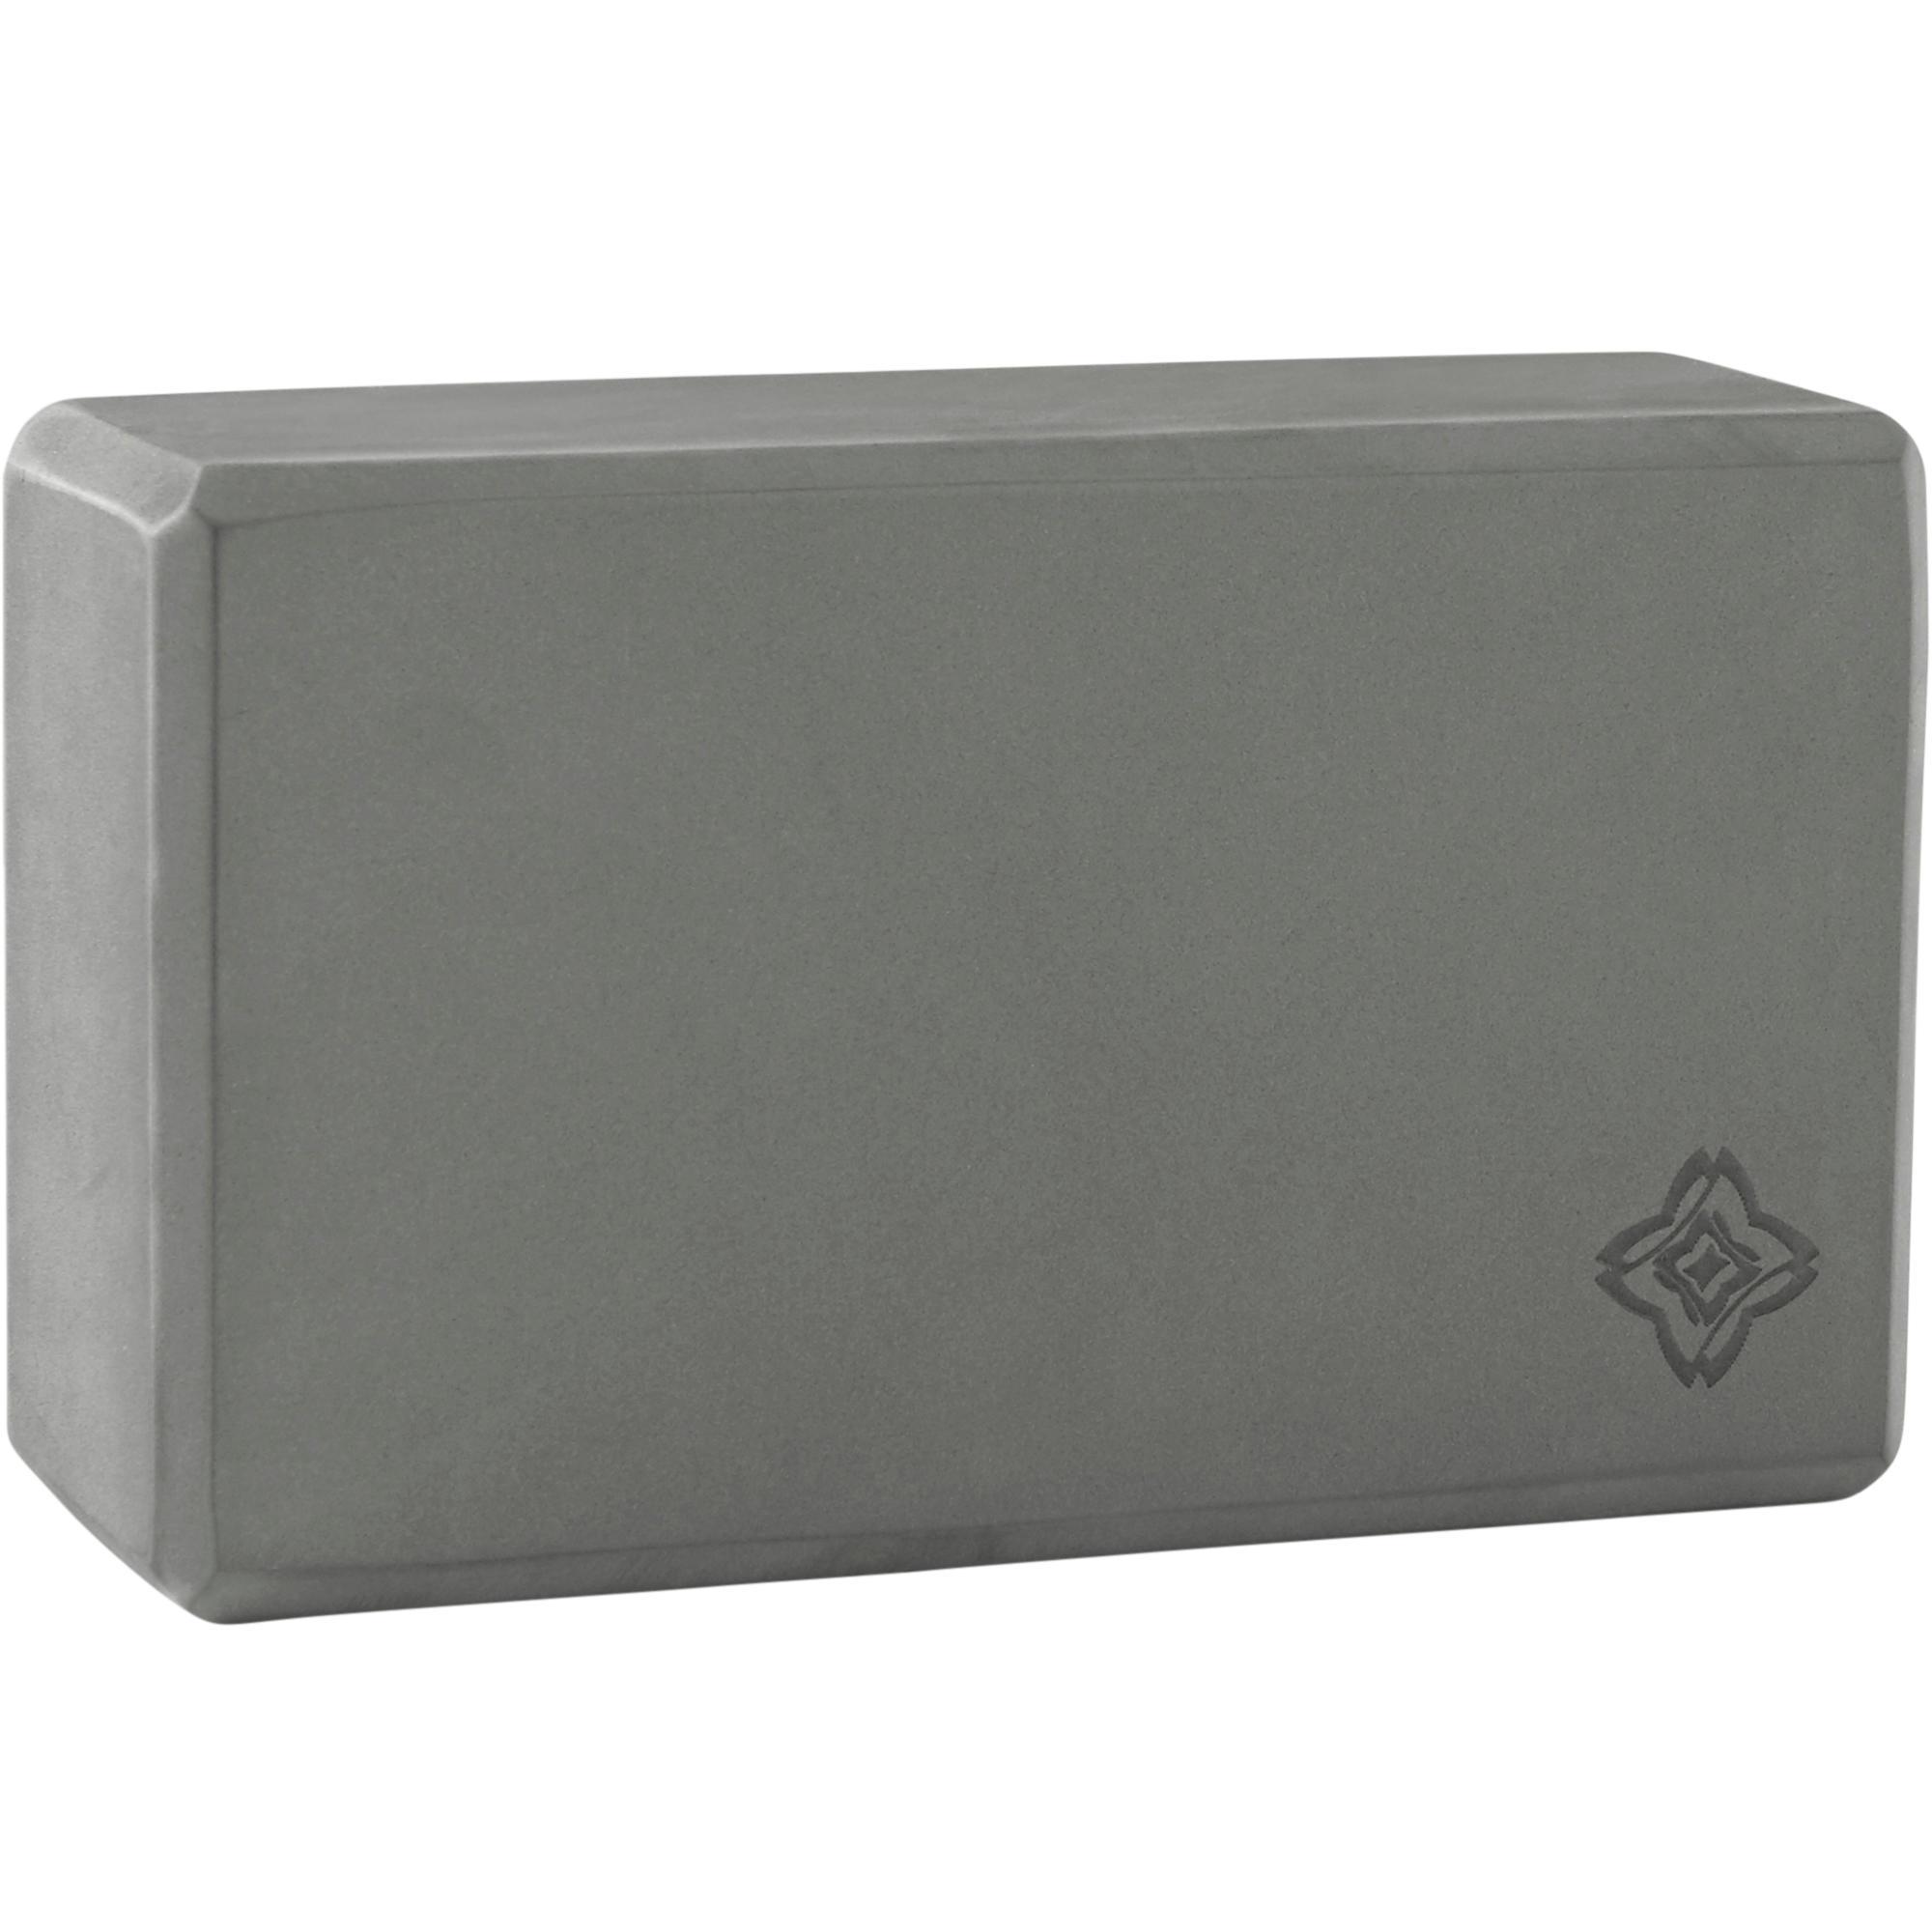 Yoga Foam Block -...